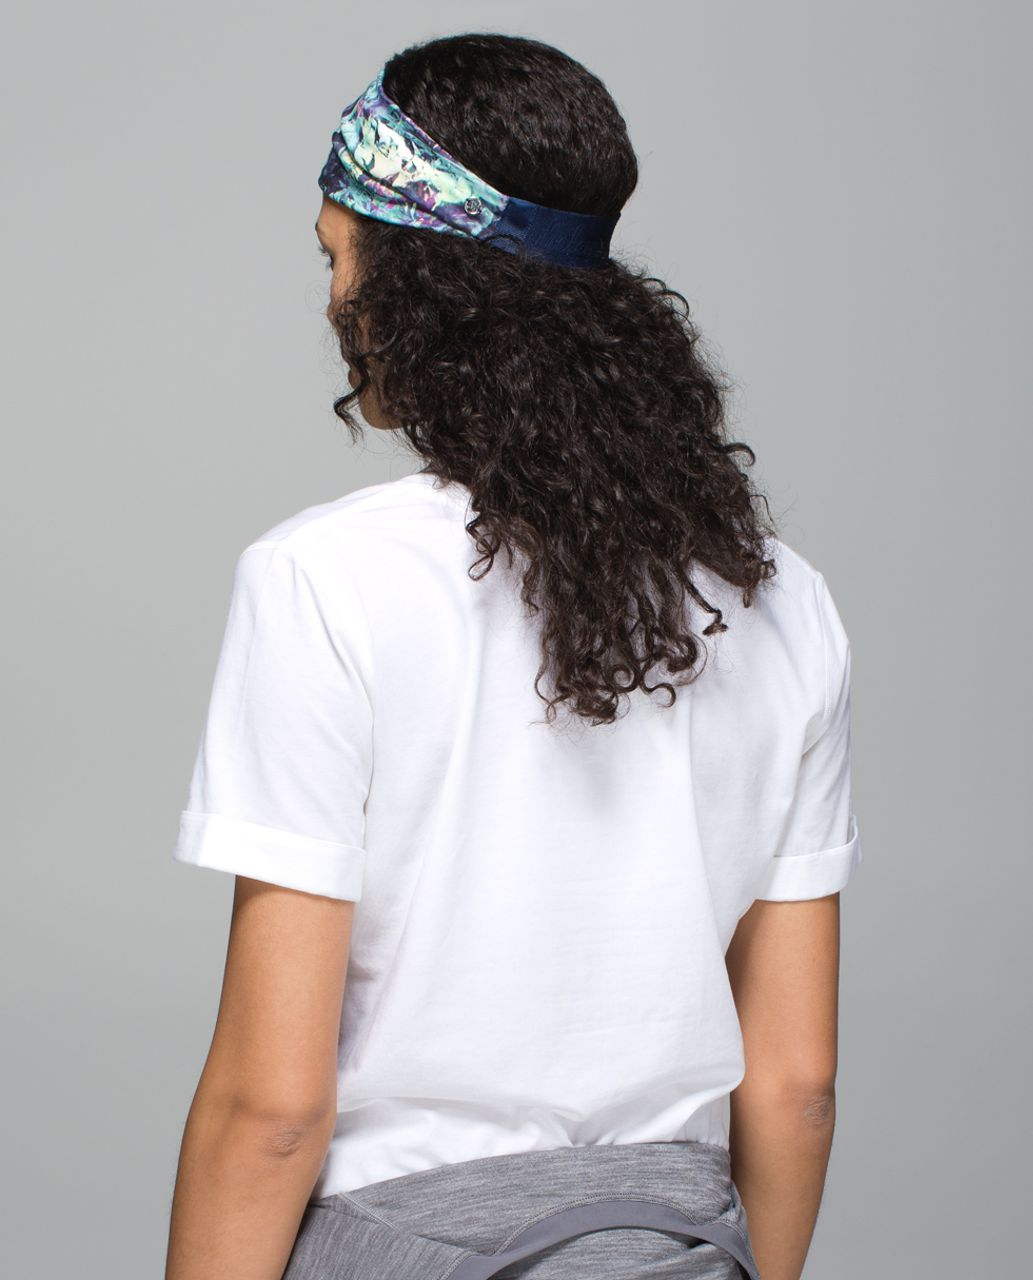 Lululemon Fringe Fighter Headband - Iridescent Multi / Heathered Deep Navy